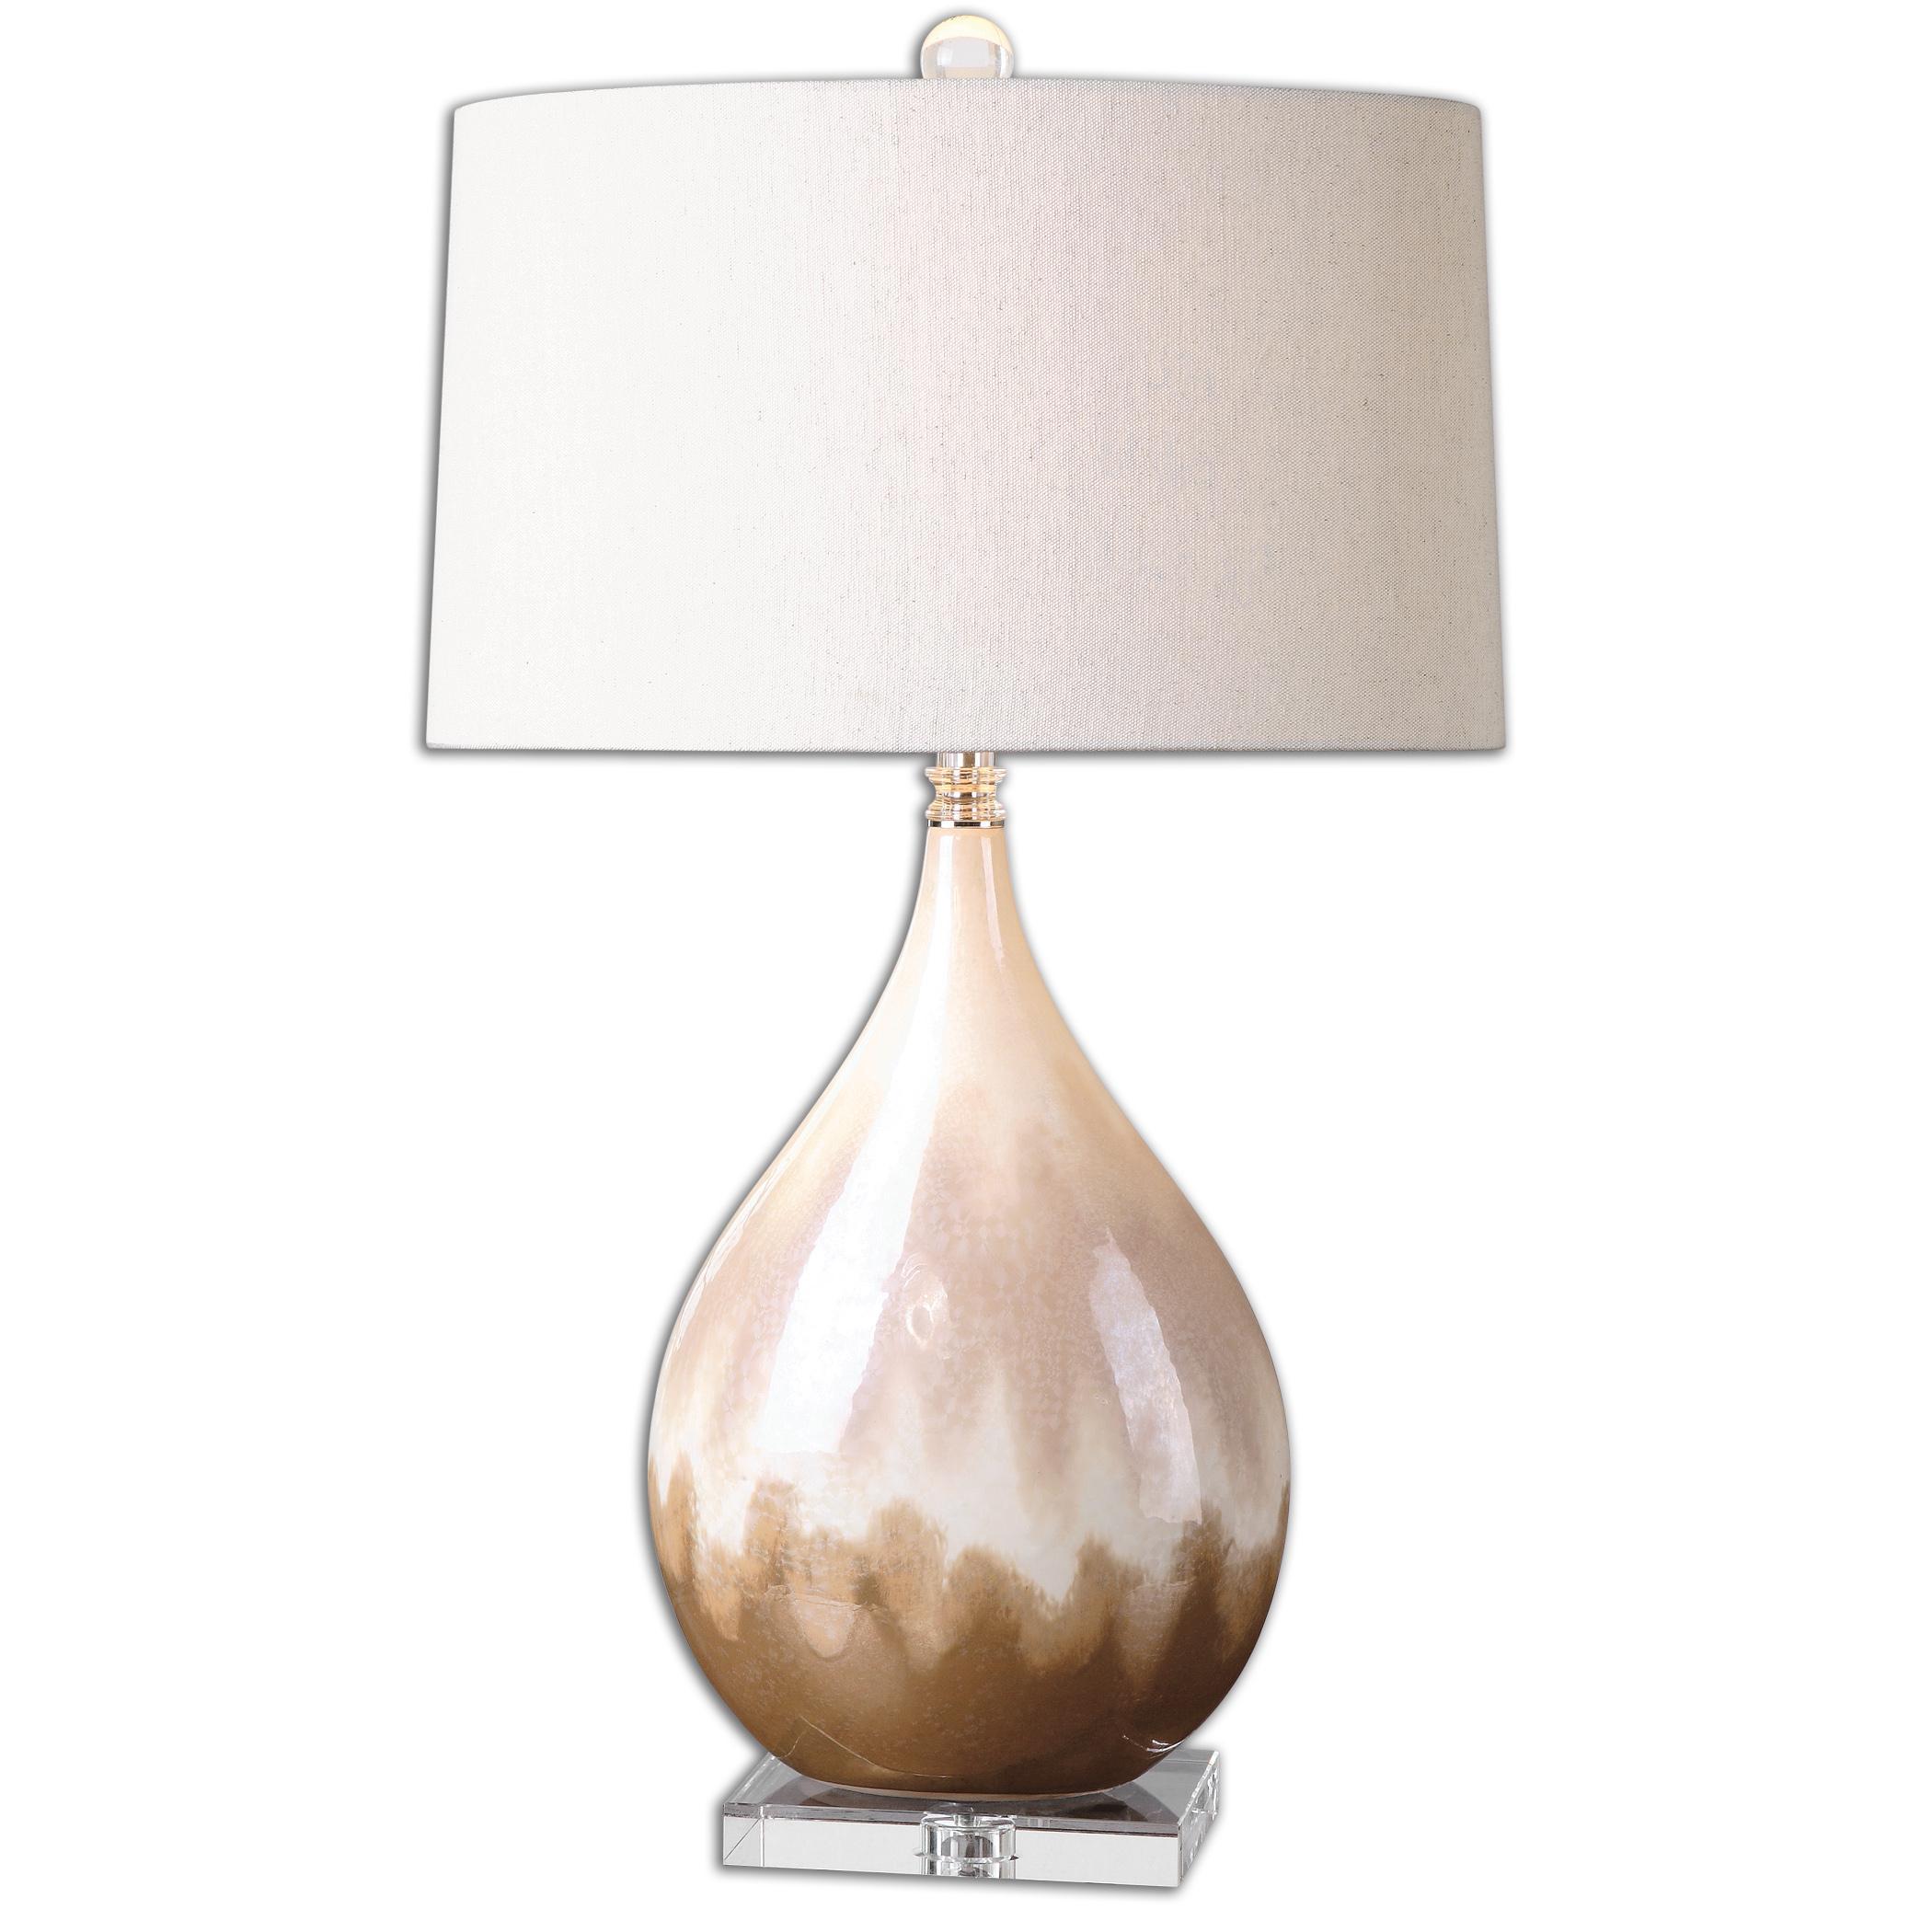 Flavian Glazed Ceramic Lamp